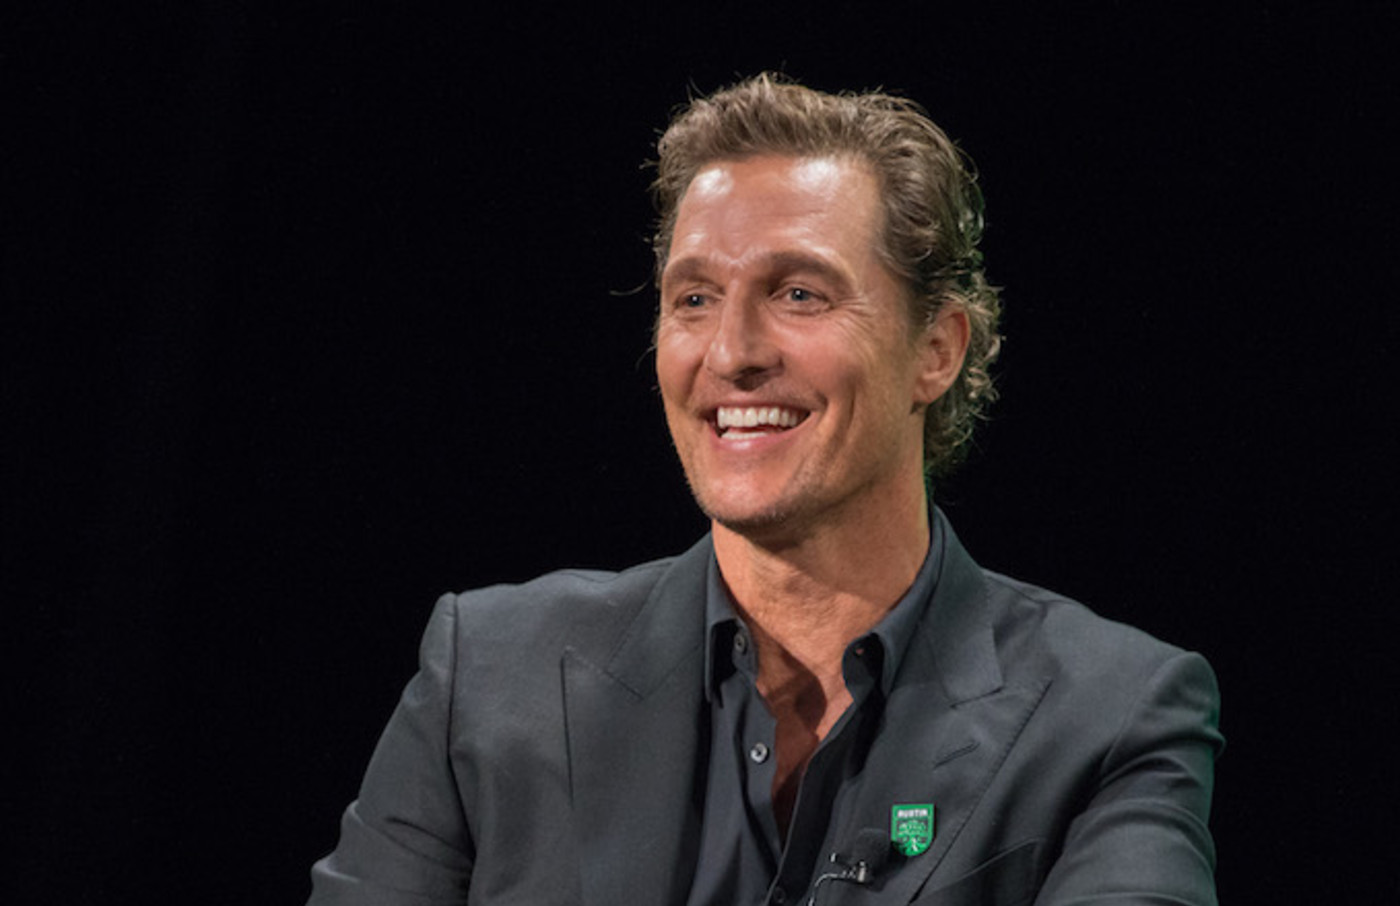 Matthew McConaughey attends the Austin FC Major League Soccer club announcement.